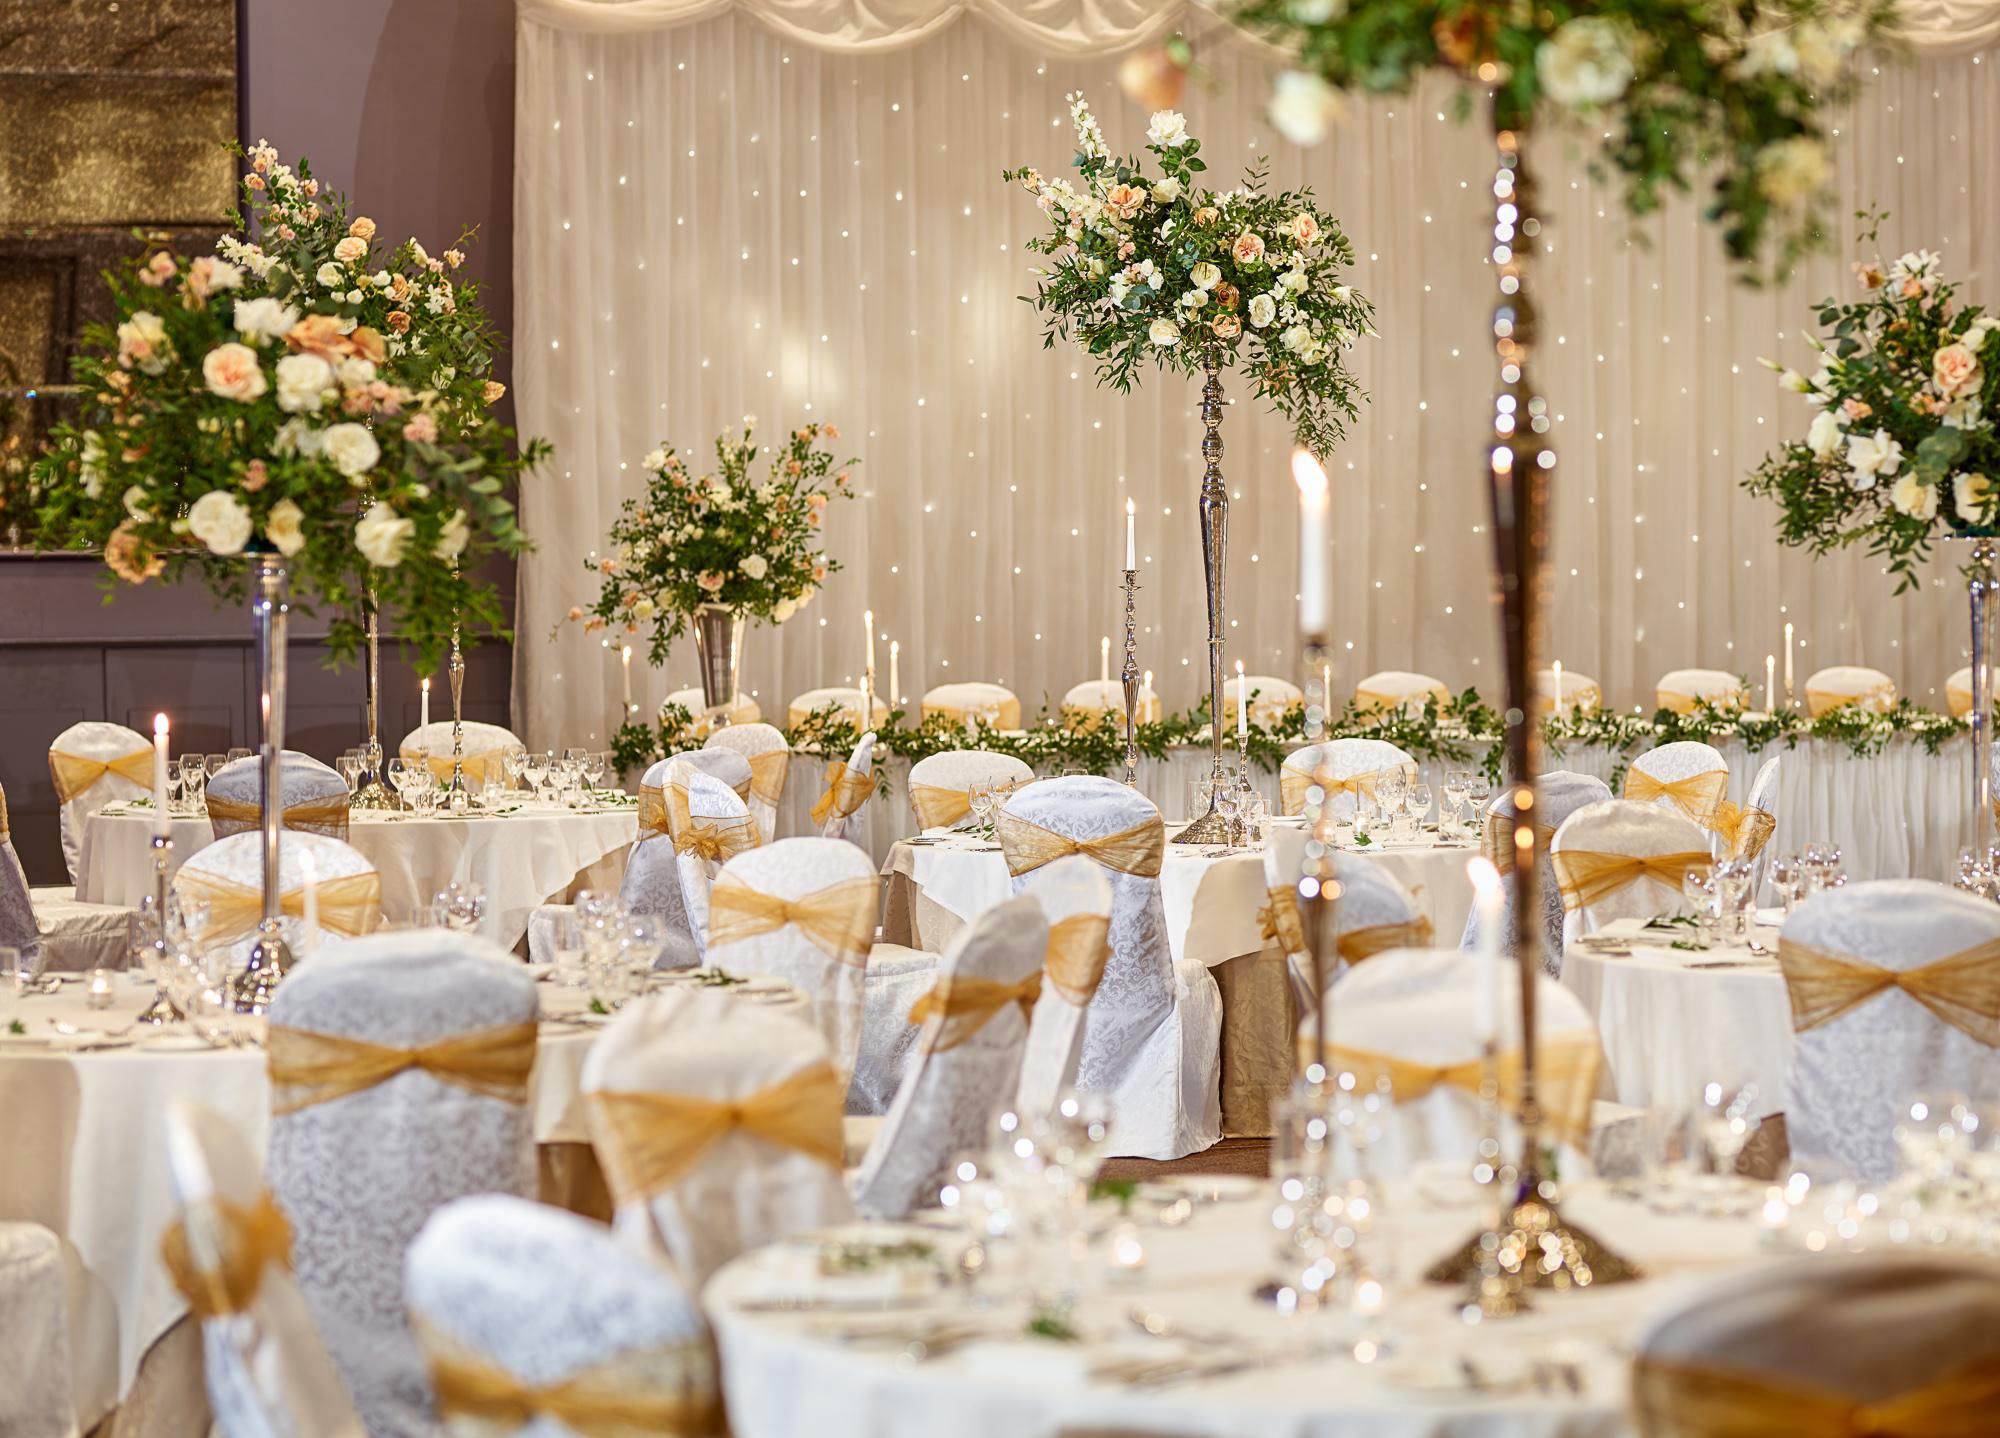 Galmont Wedding 2 2000px.jpg